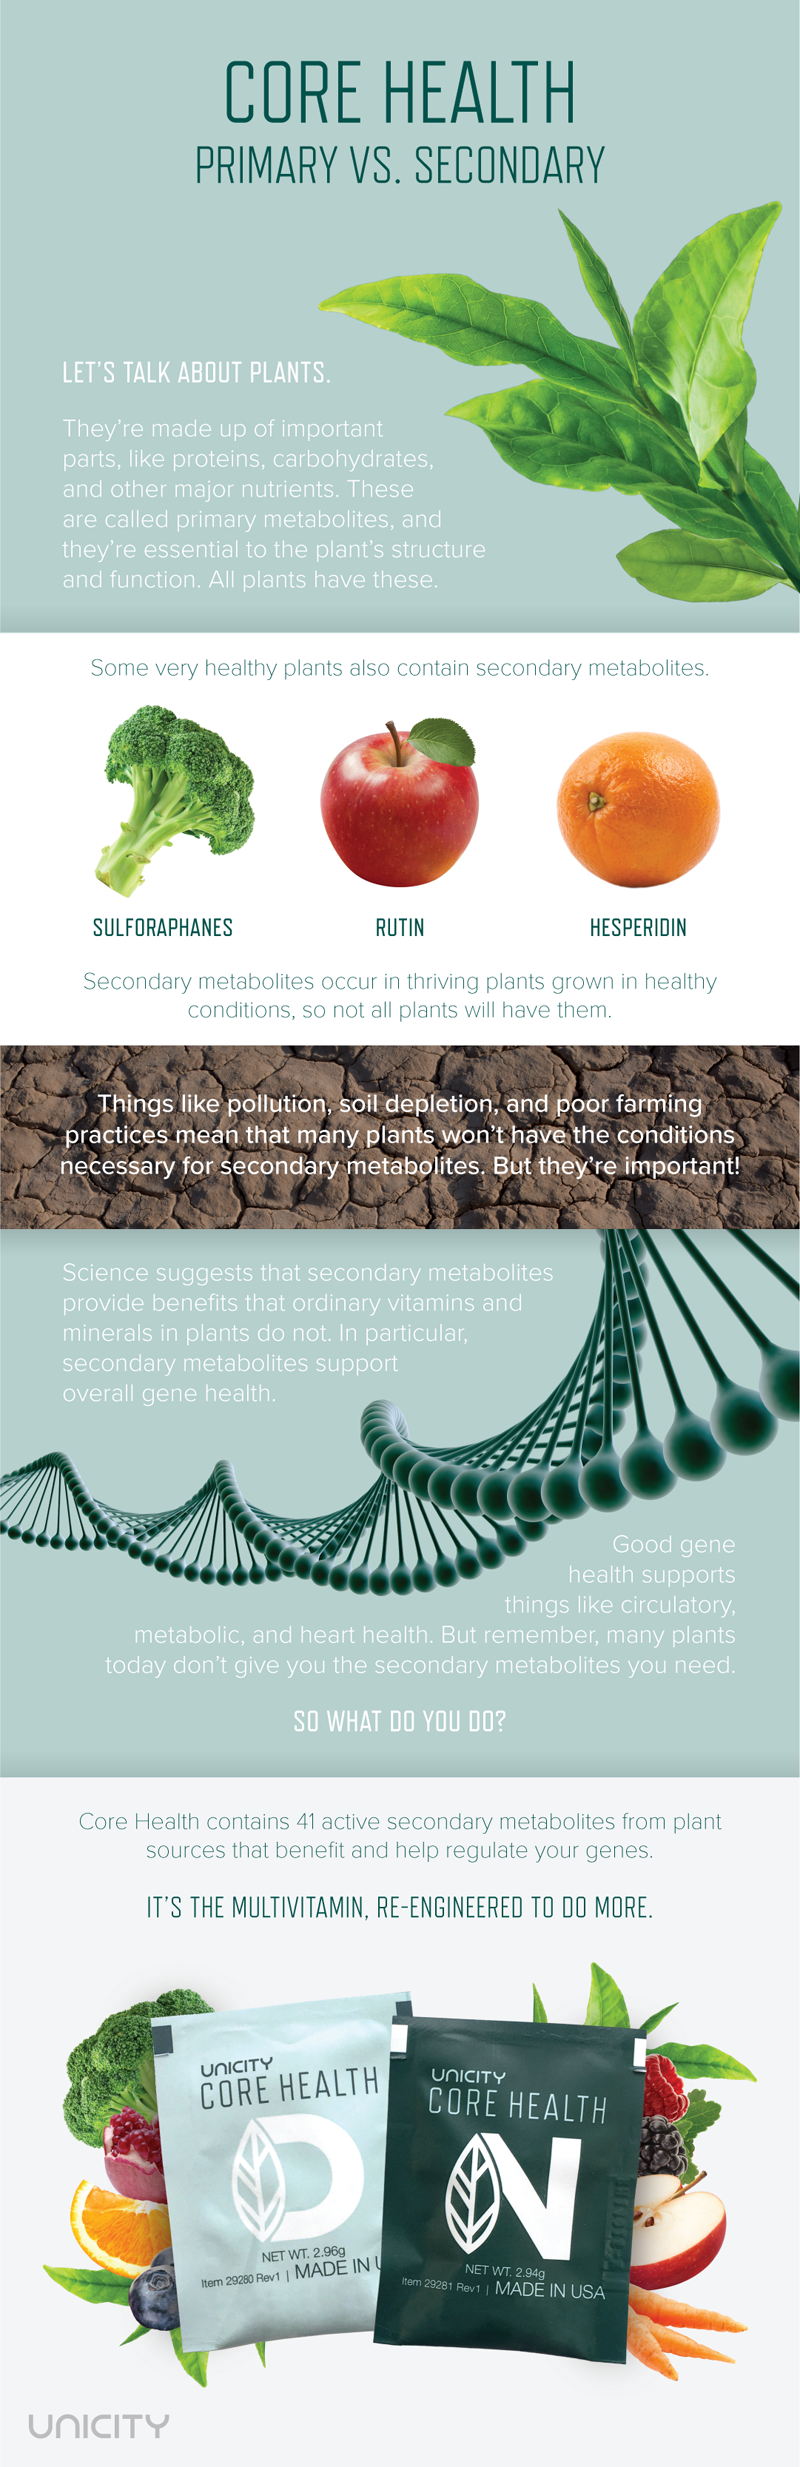 Core Health: Primary Vs. Secondary Metabolites | Unicity Blog